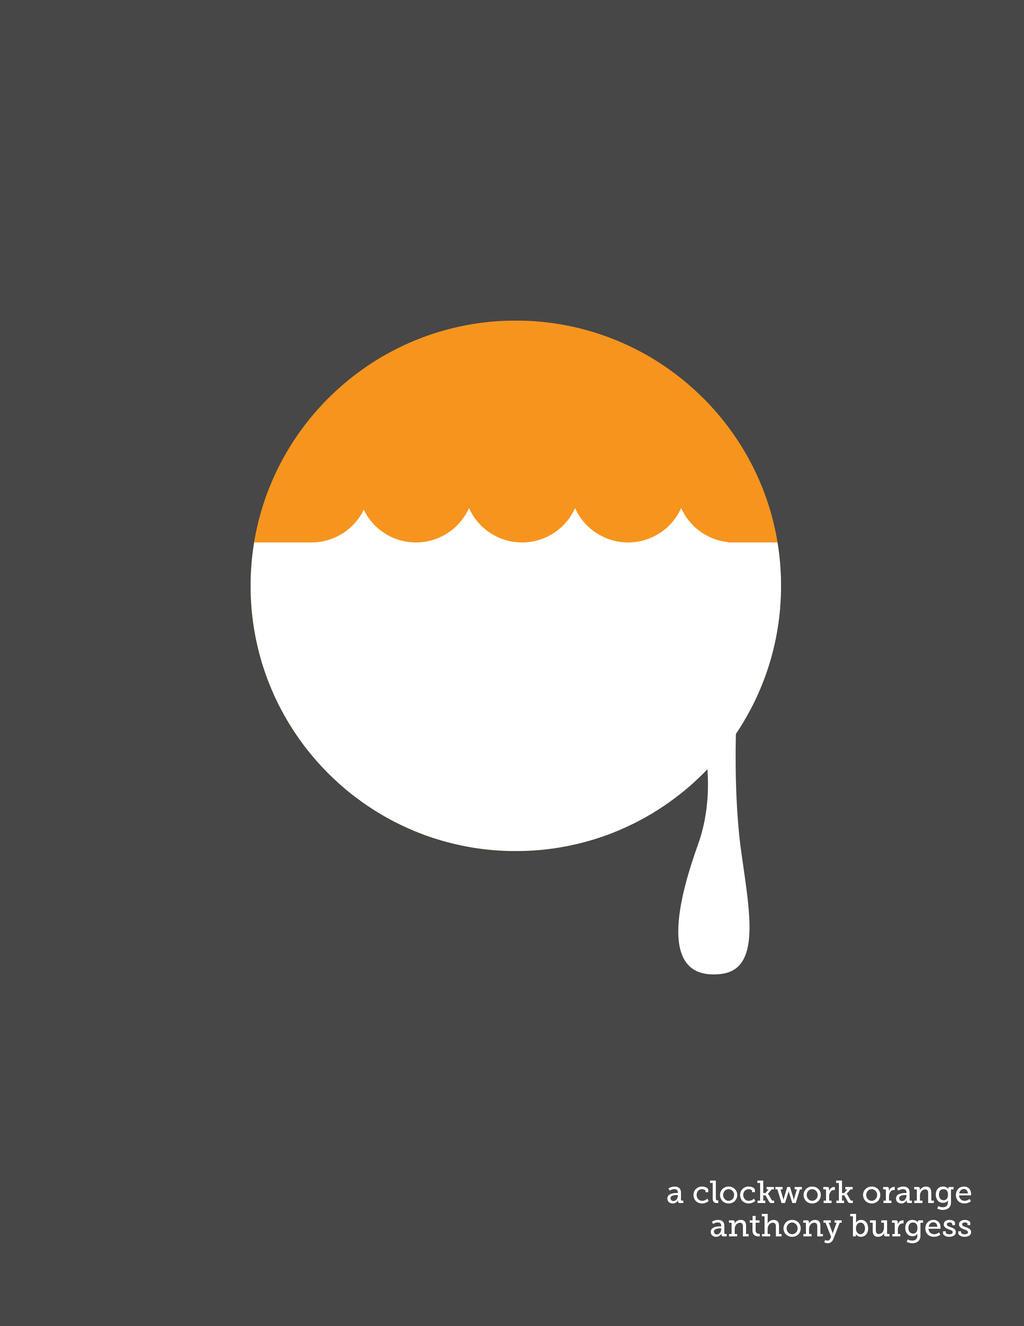 clockwork orange minimalist 1920x1200 - photo #12